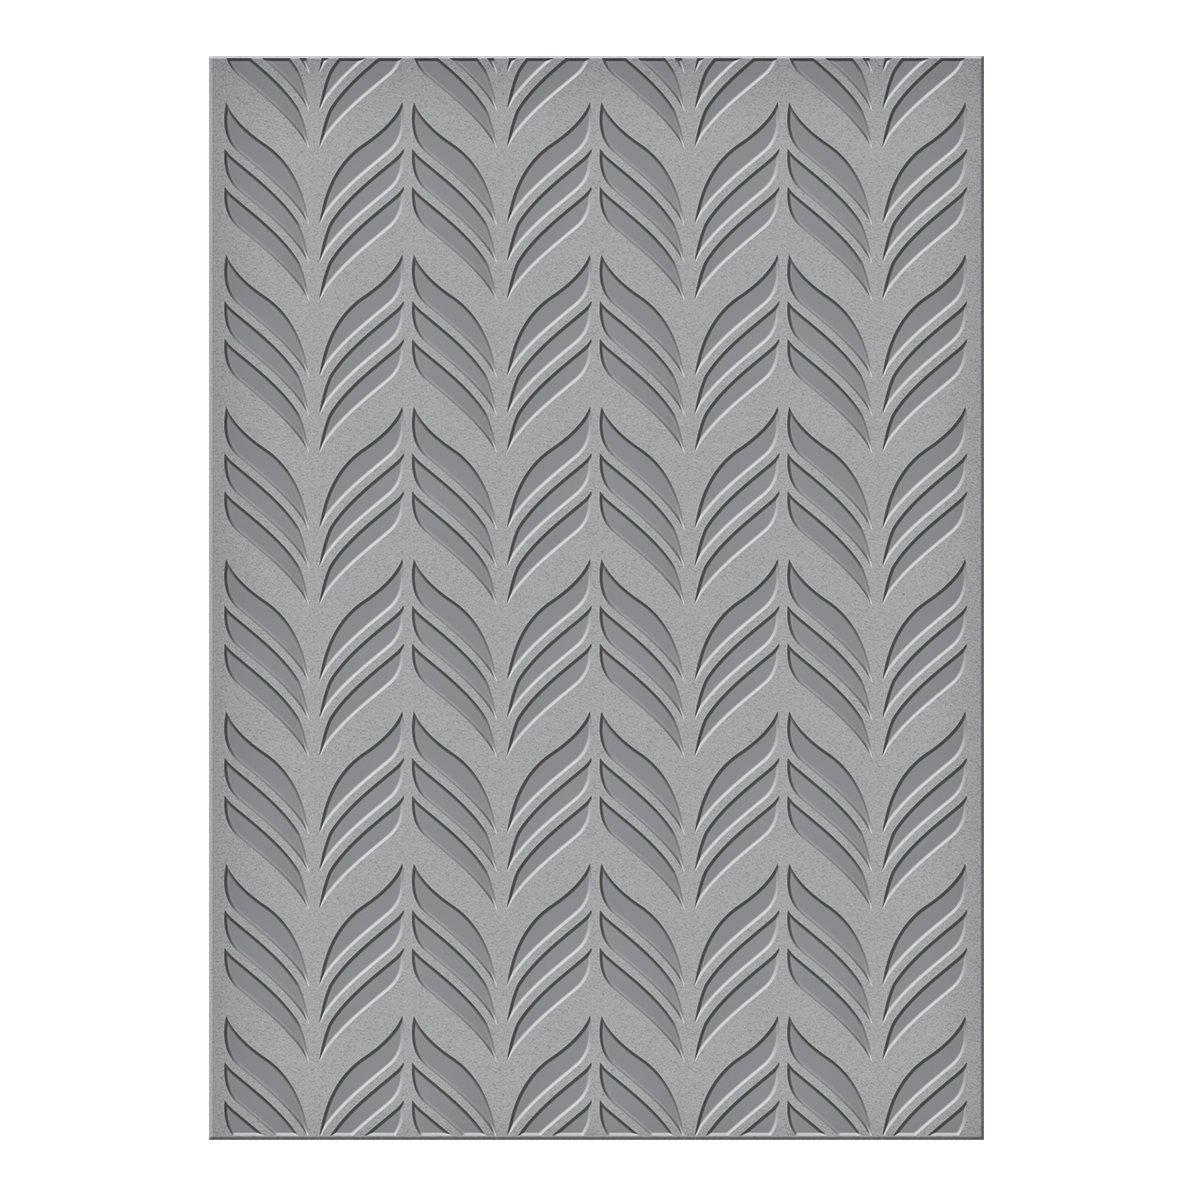 Spellbinders S6-072 Deco Chevron Texture Plate